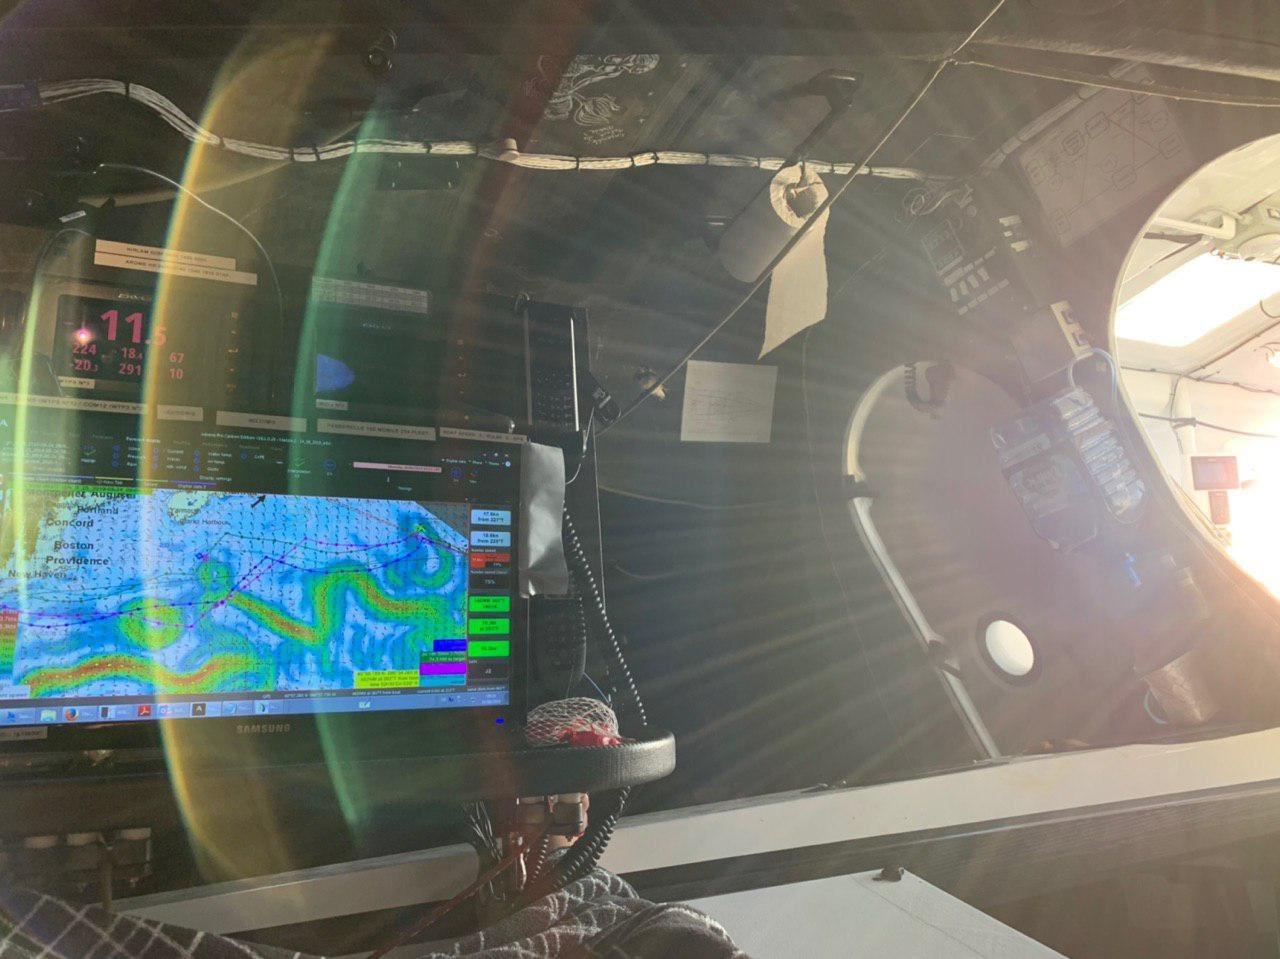 photo:@borisherrmann;desc:Checking the weather